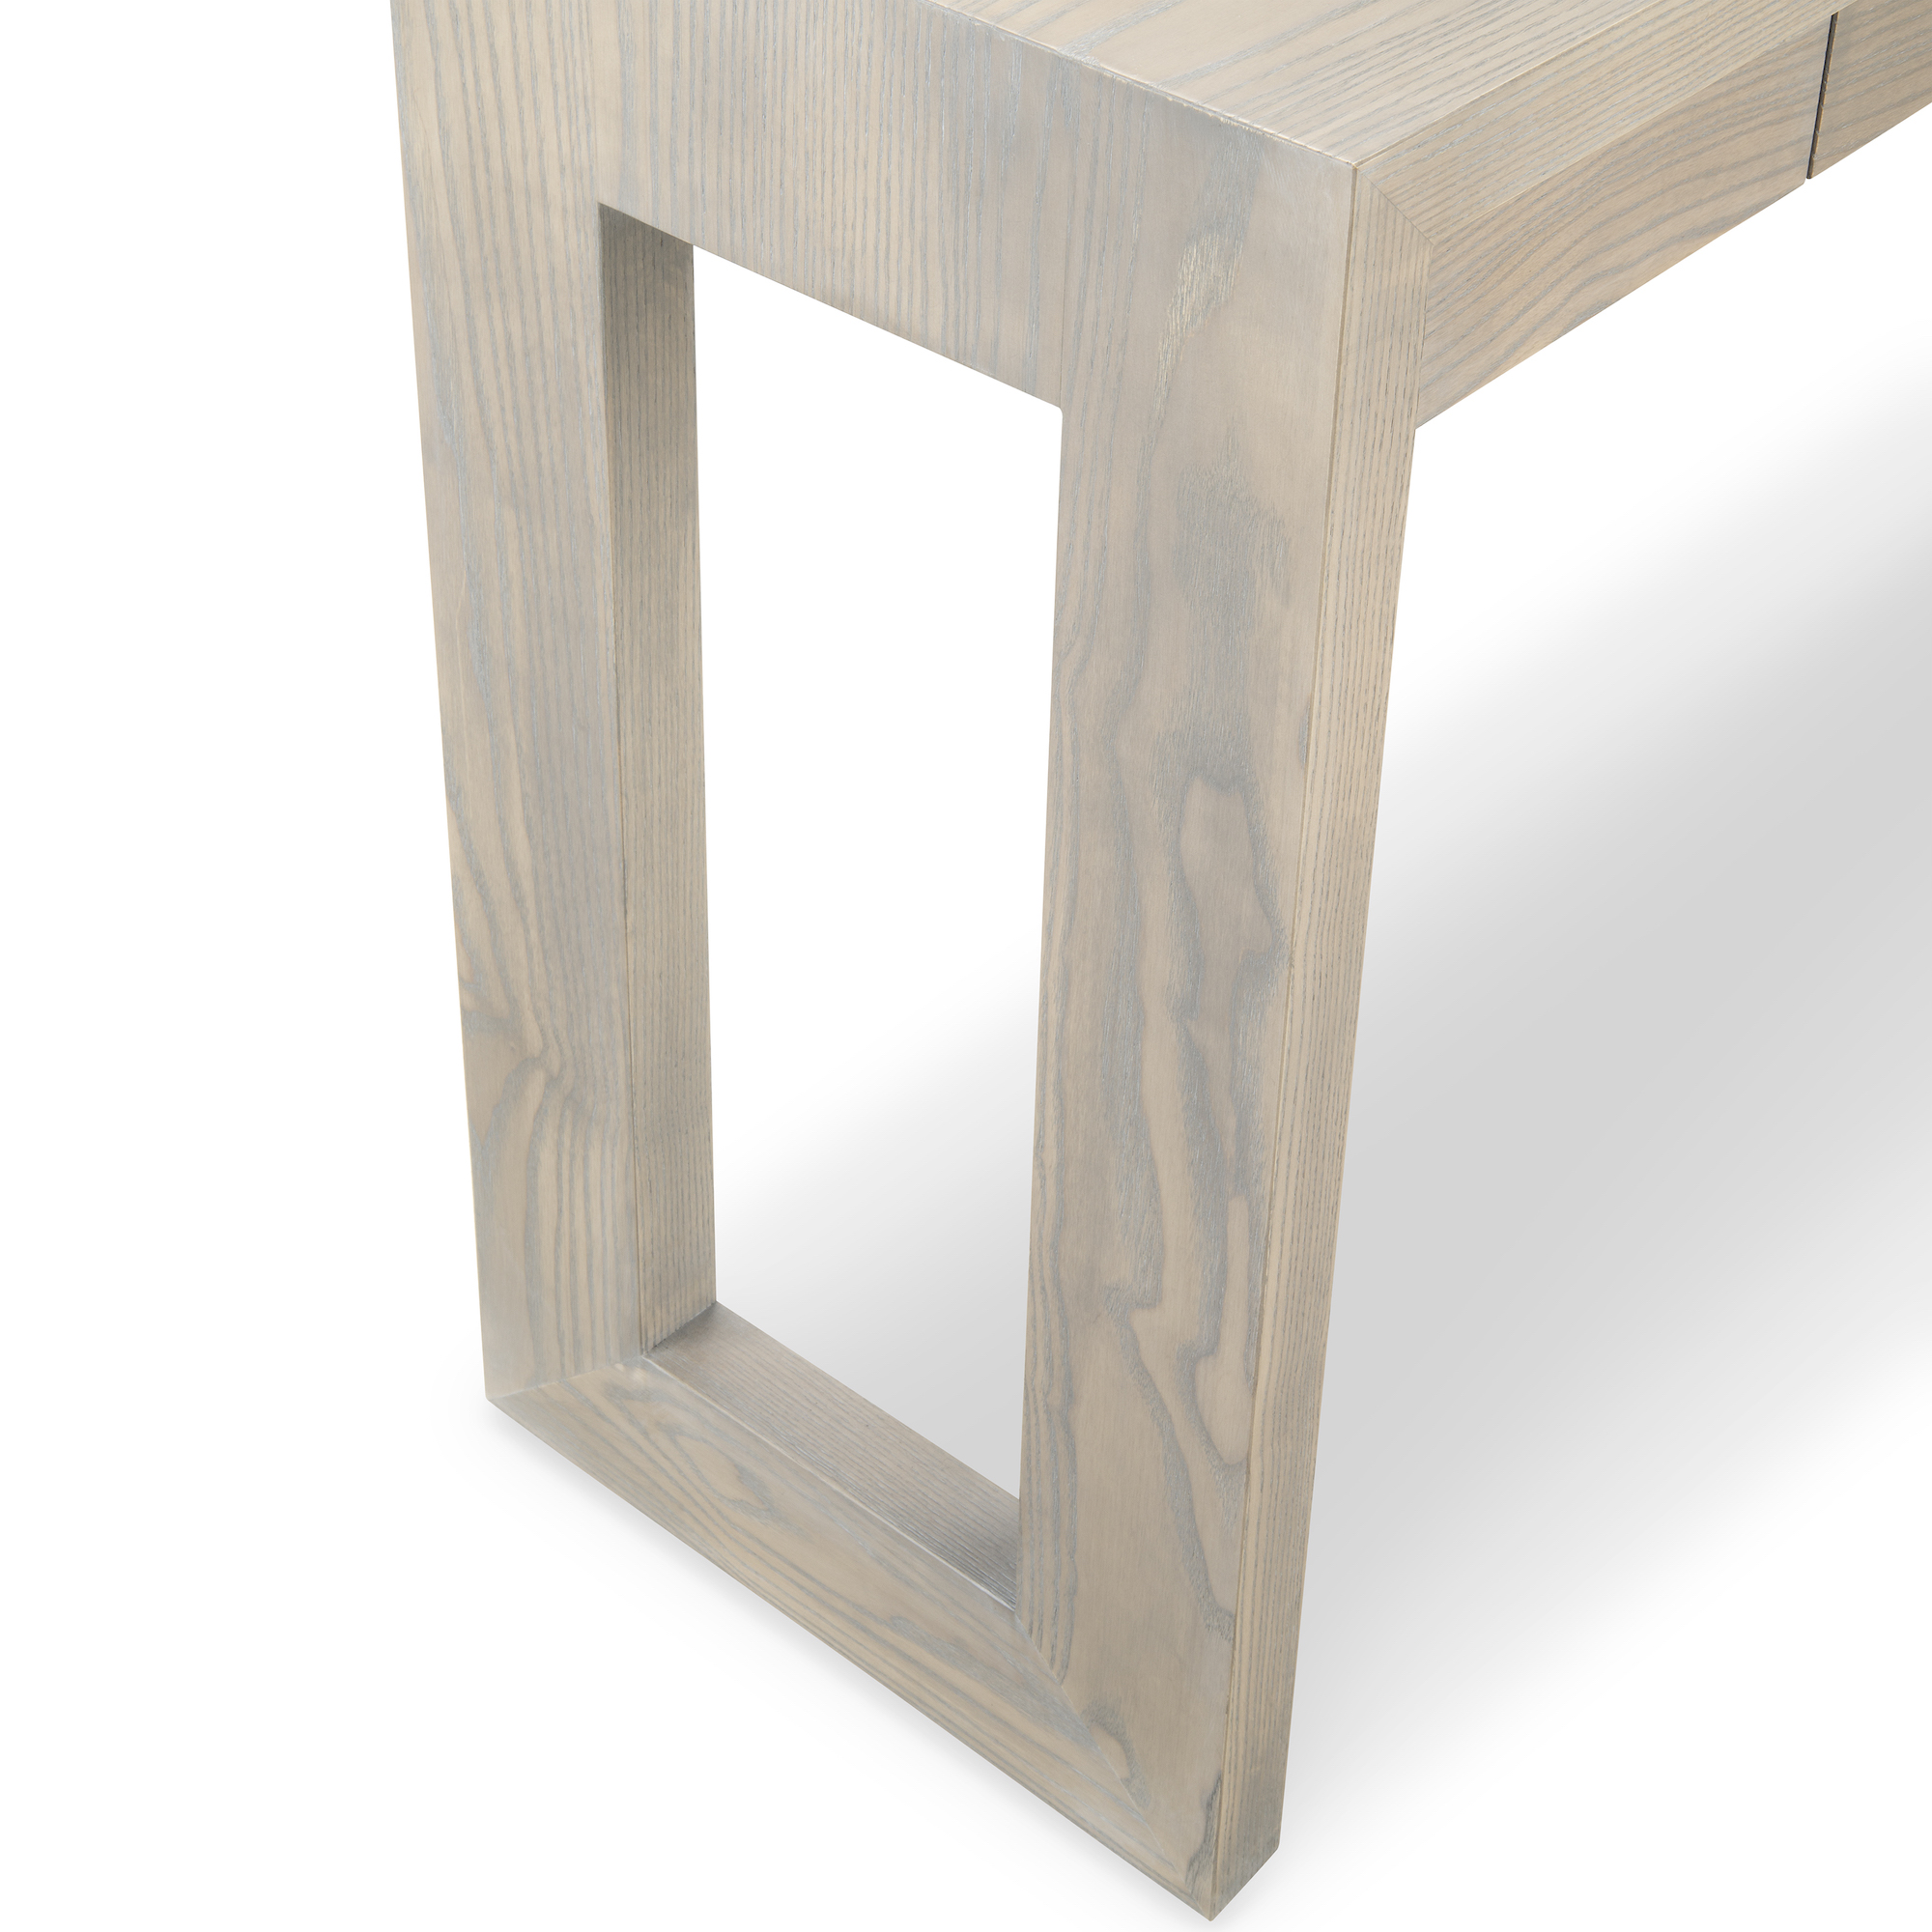 Fifshire_Sofa_Table_Detail-1.jpg